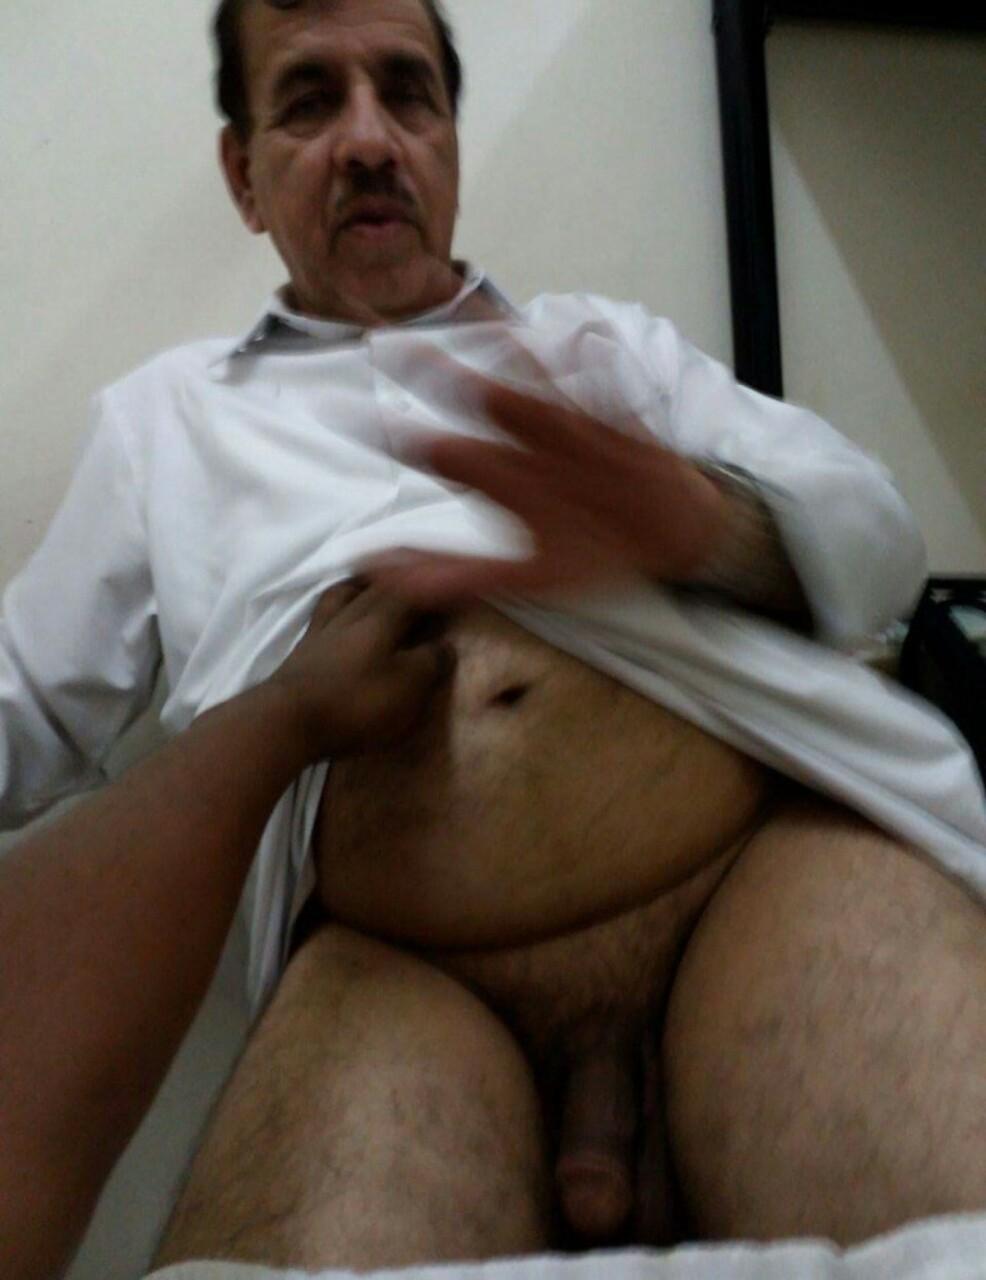 Naked Mustache Indian Dad Tumblr - Datawav-4528